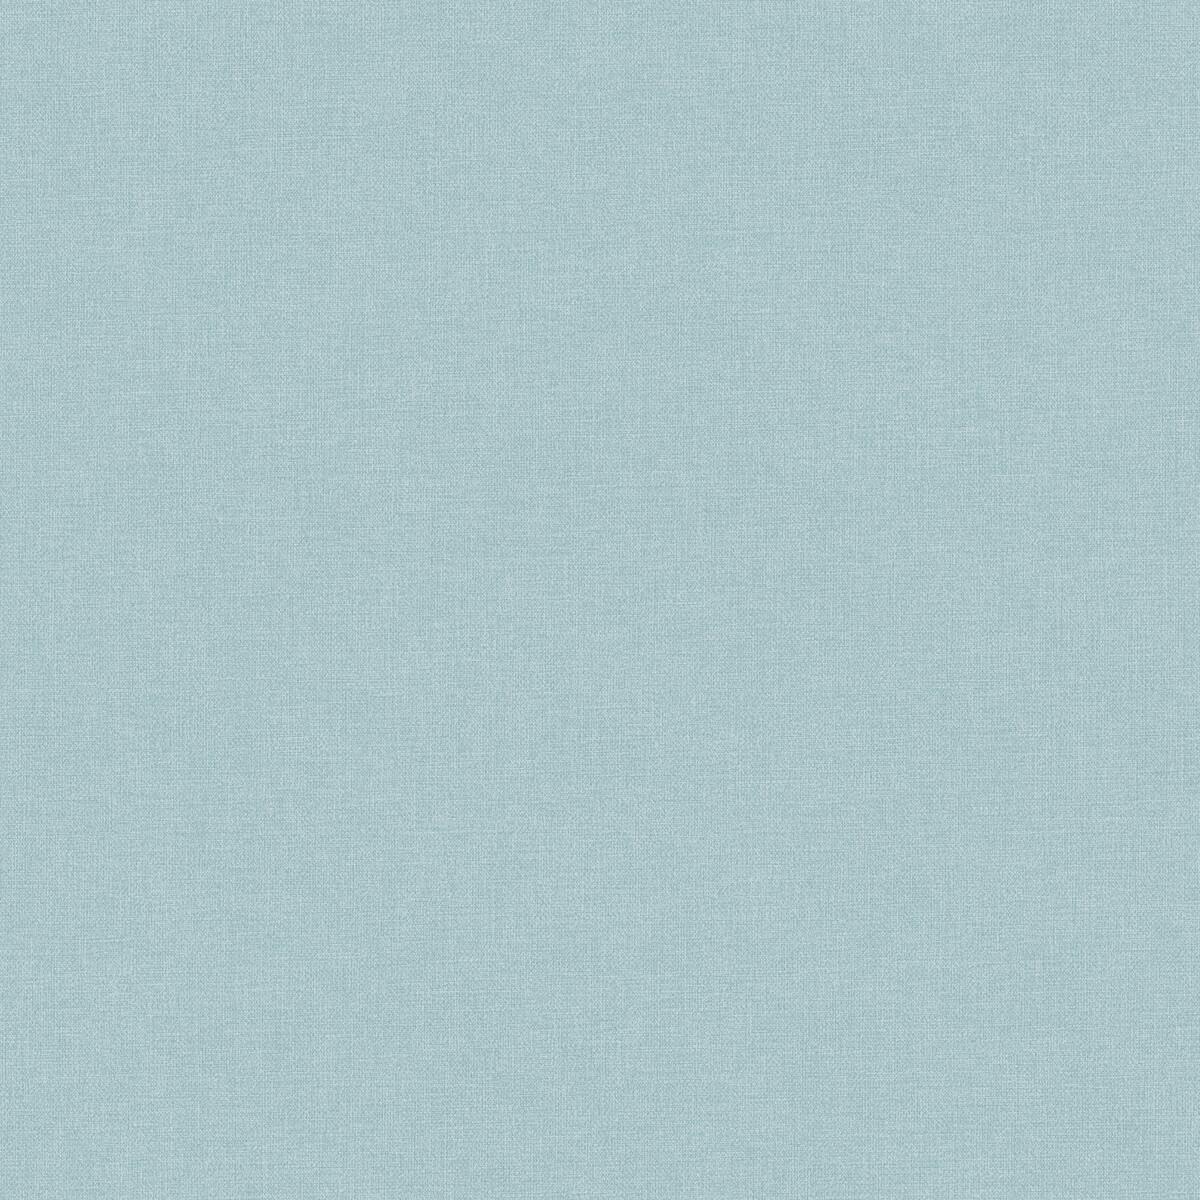 Sorbus Licht Blauw jf1306